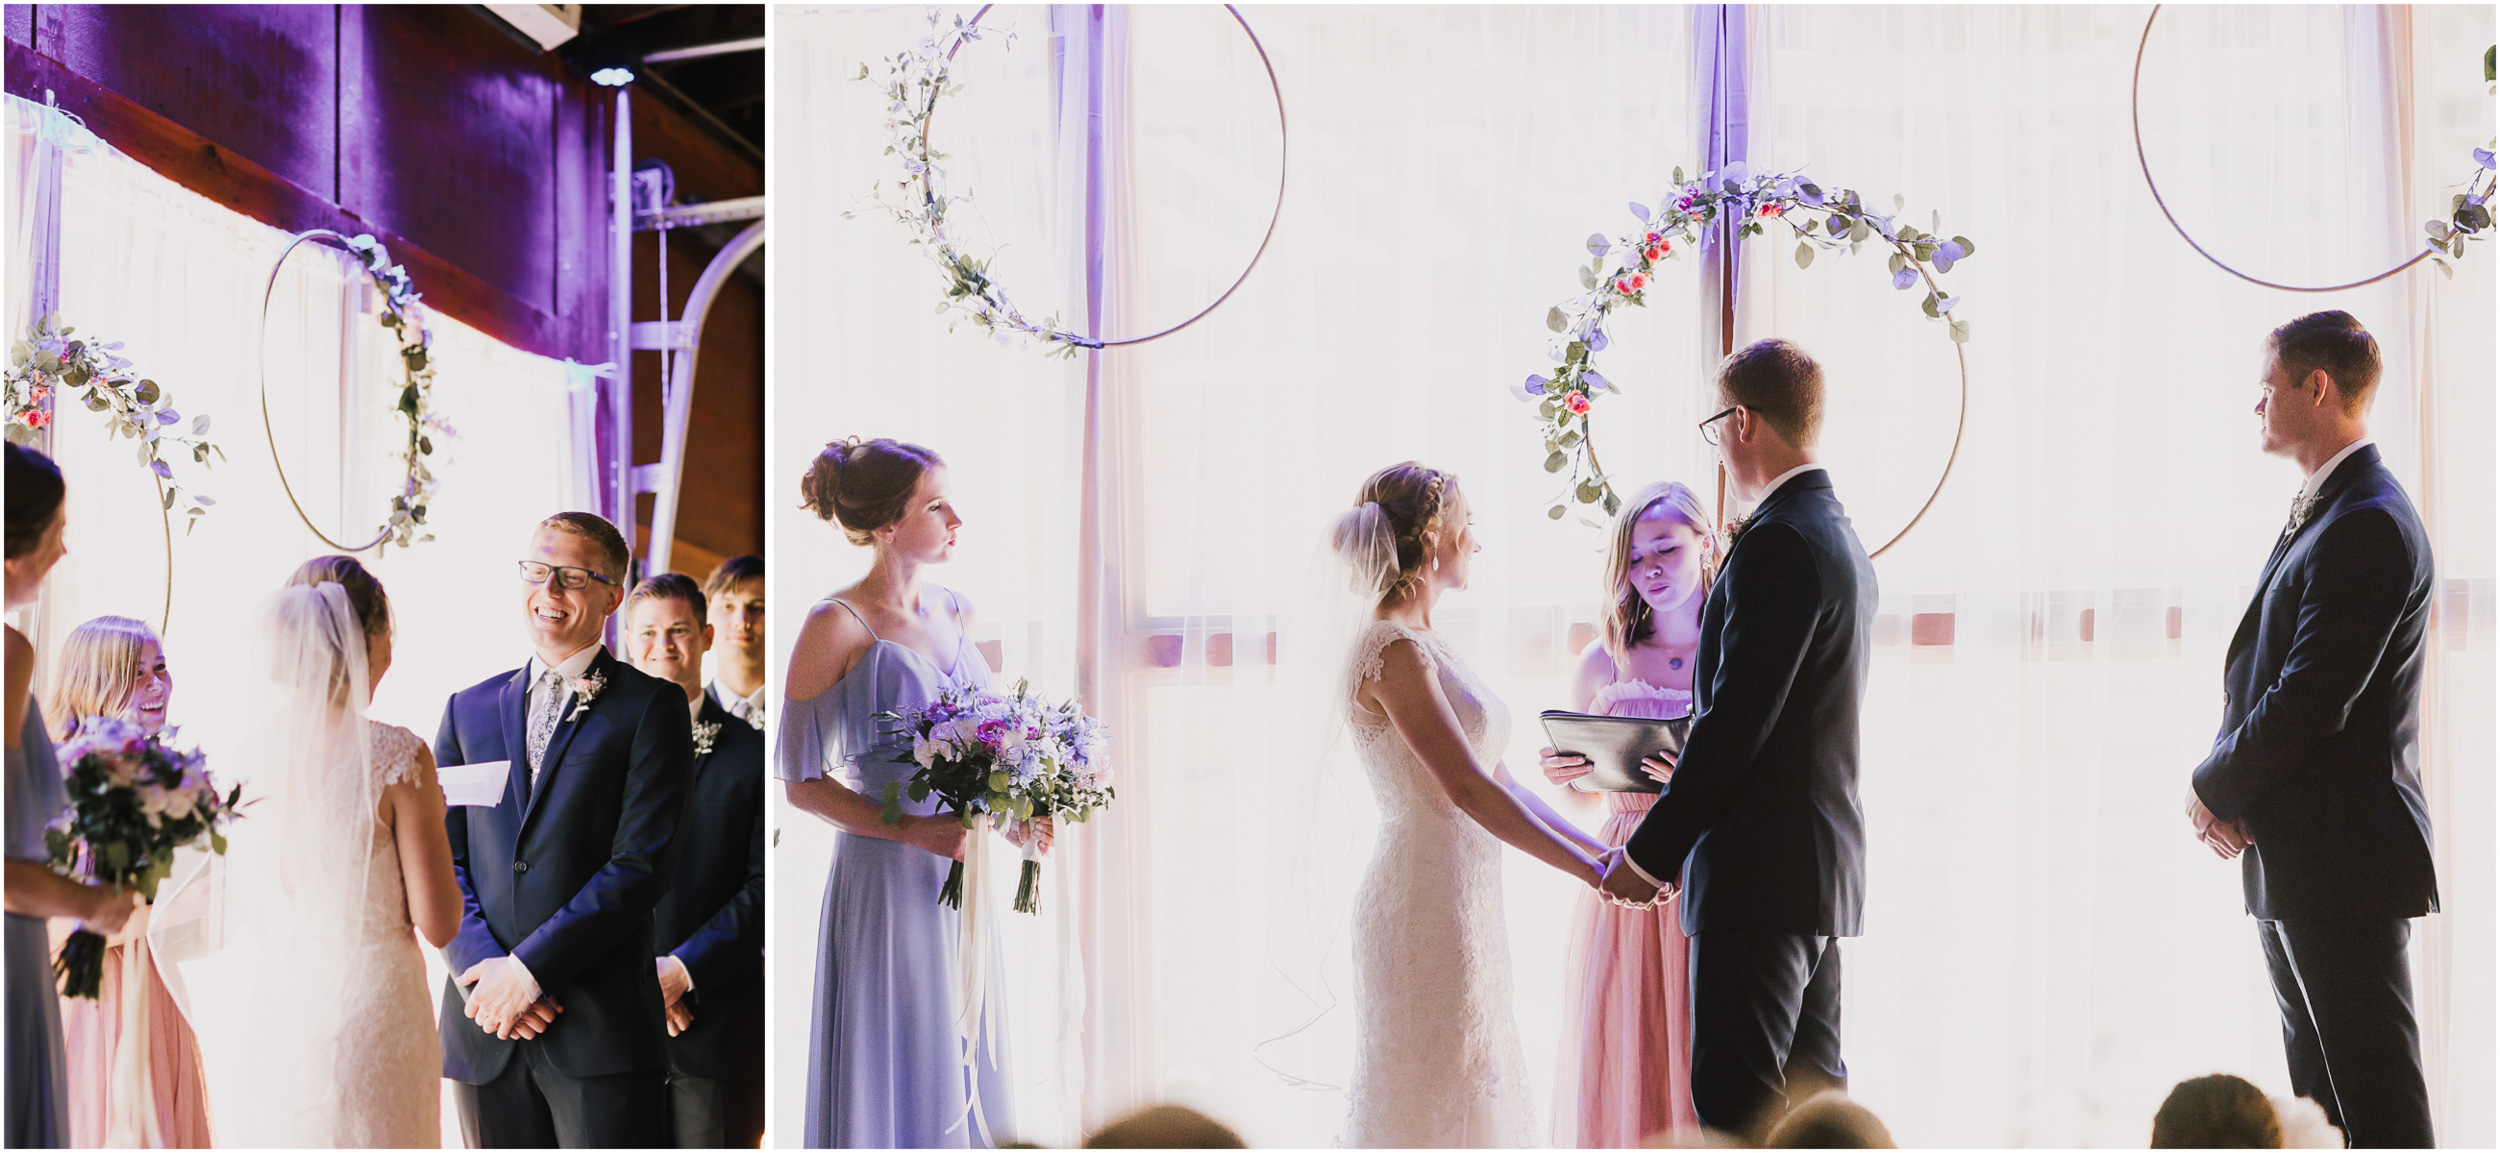 alyssa barletter photography classic kansas city summer wedding photographer dustin and erica king-47.jpg